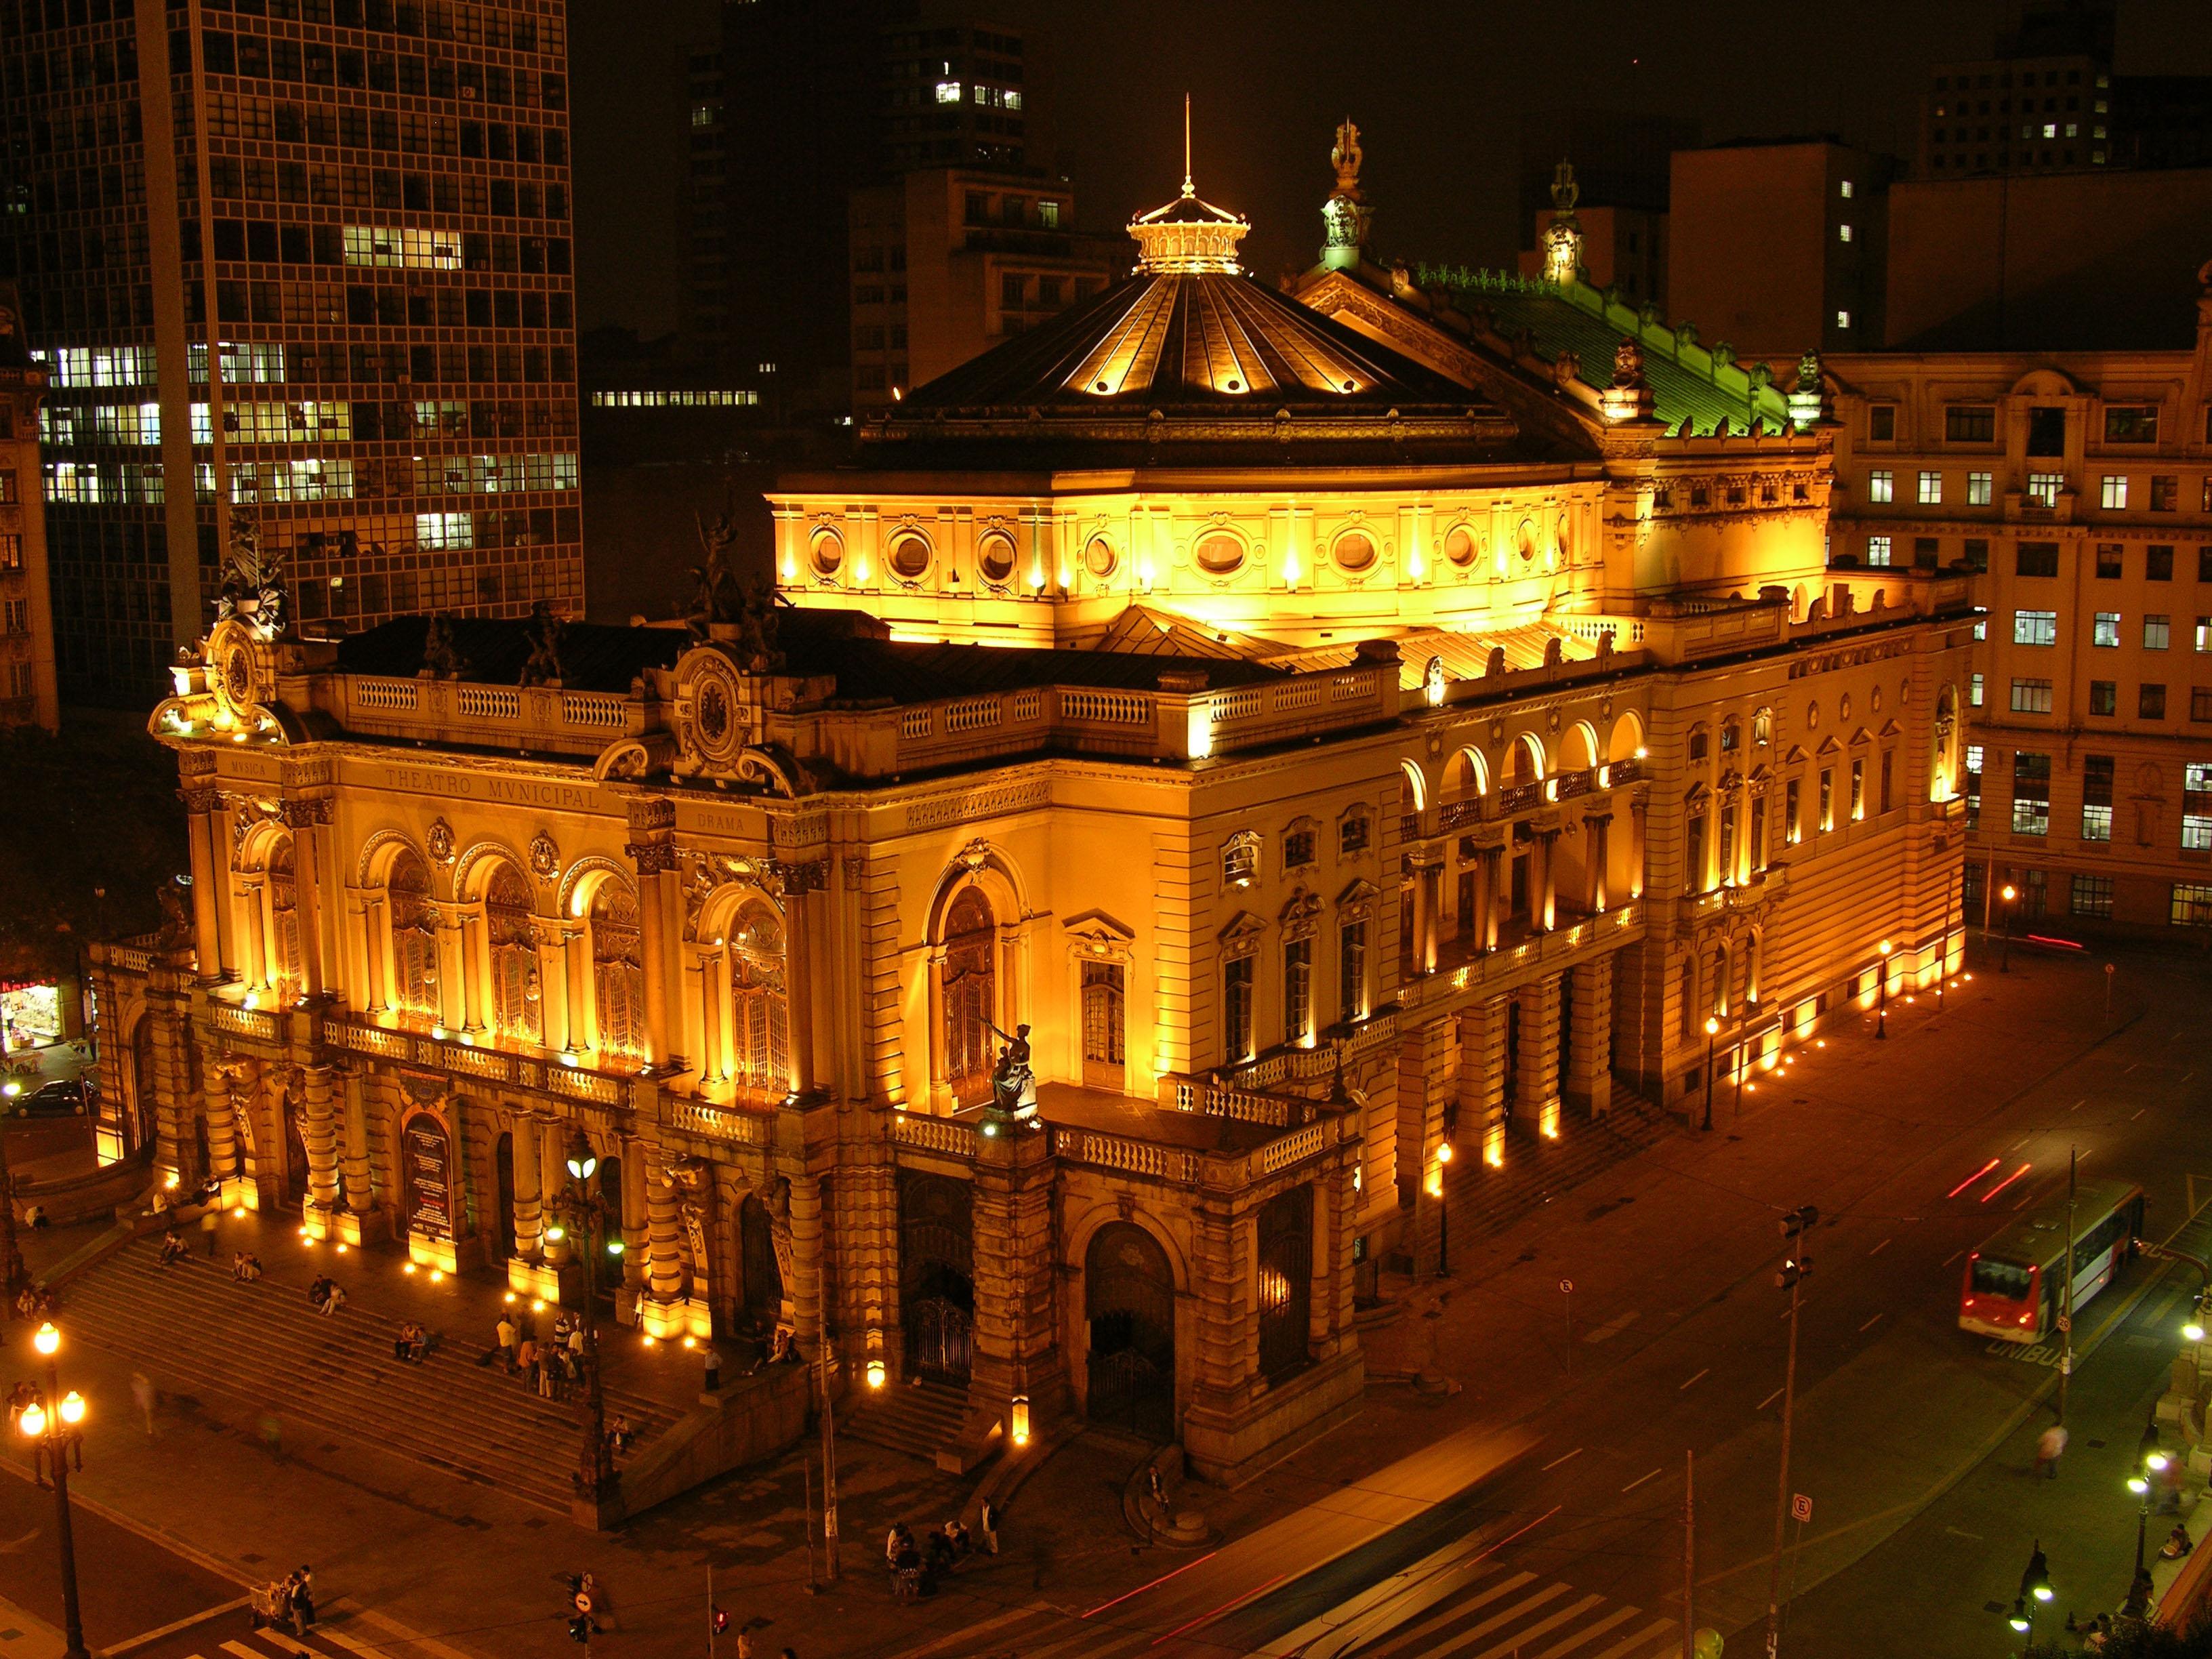 THEATRO MUNICIPAL – SÃO PAULO (SP) – 22.04.05 – GERAL – THEATRO MUNICIPAL DE SÃO PAULO - FOTO: JEFFERSON PANCIERI/SPTURIS.